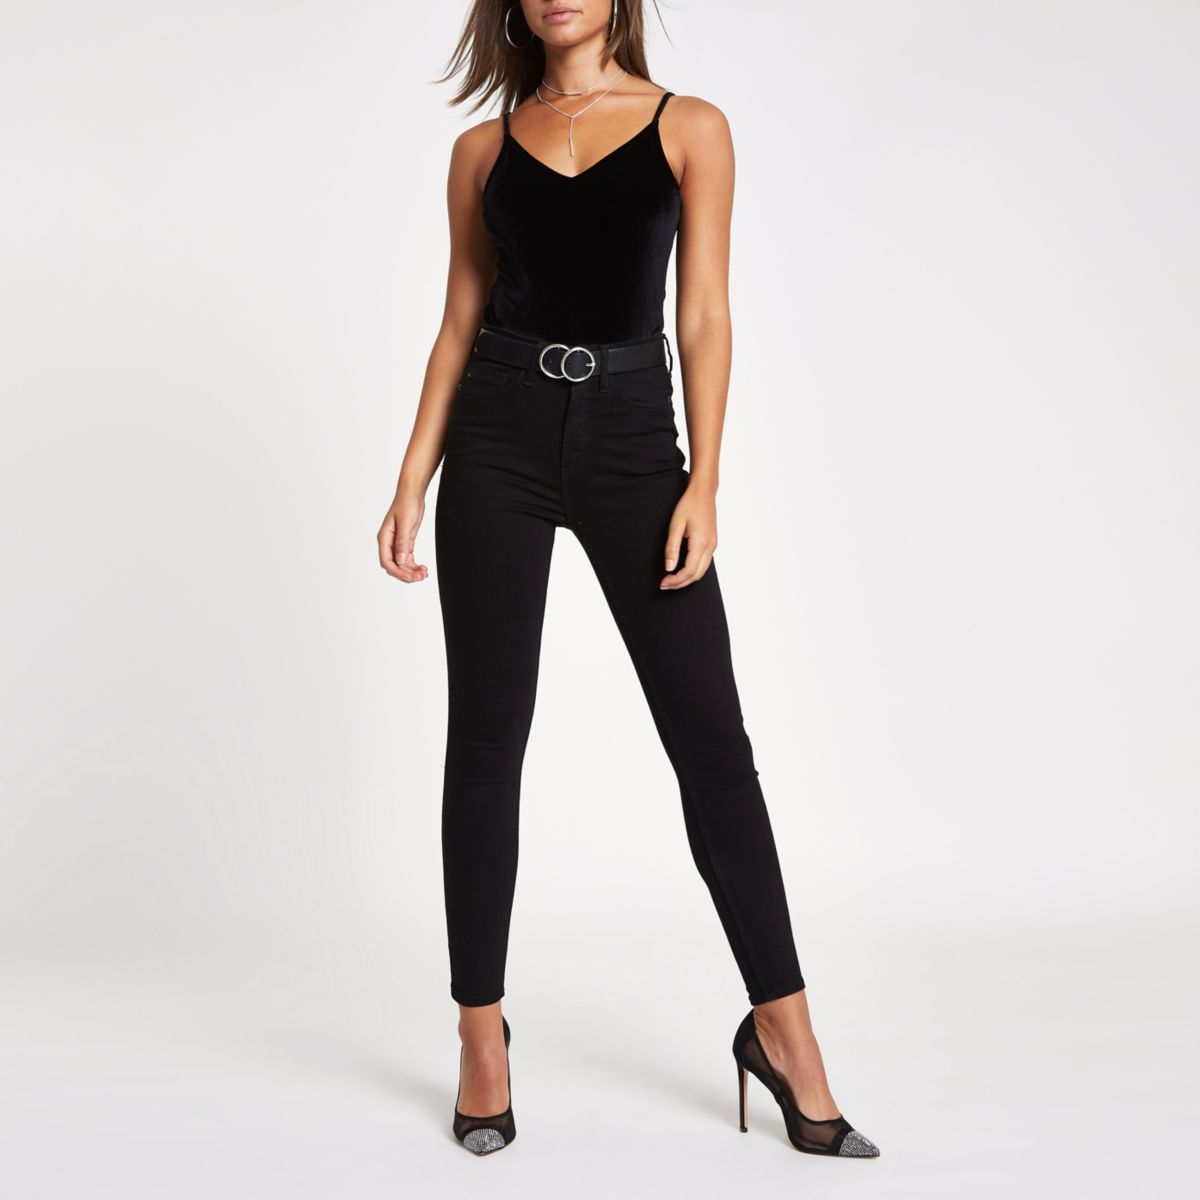 Black velvet V neck cami body